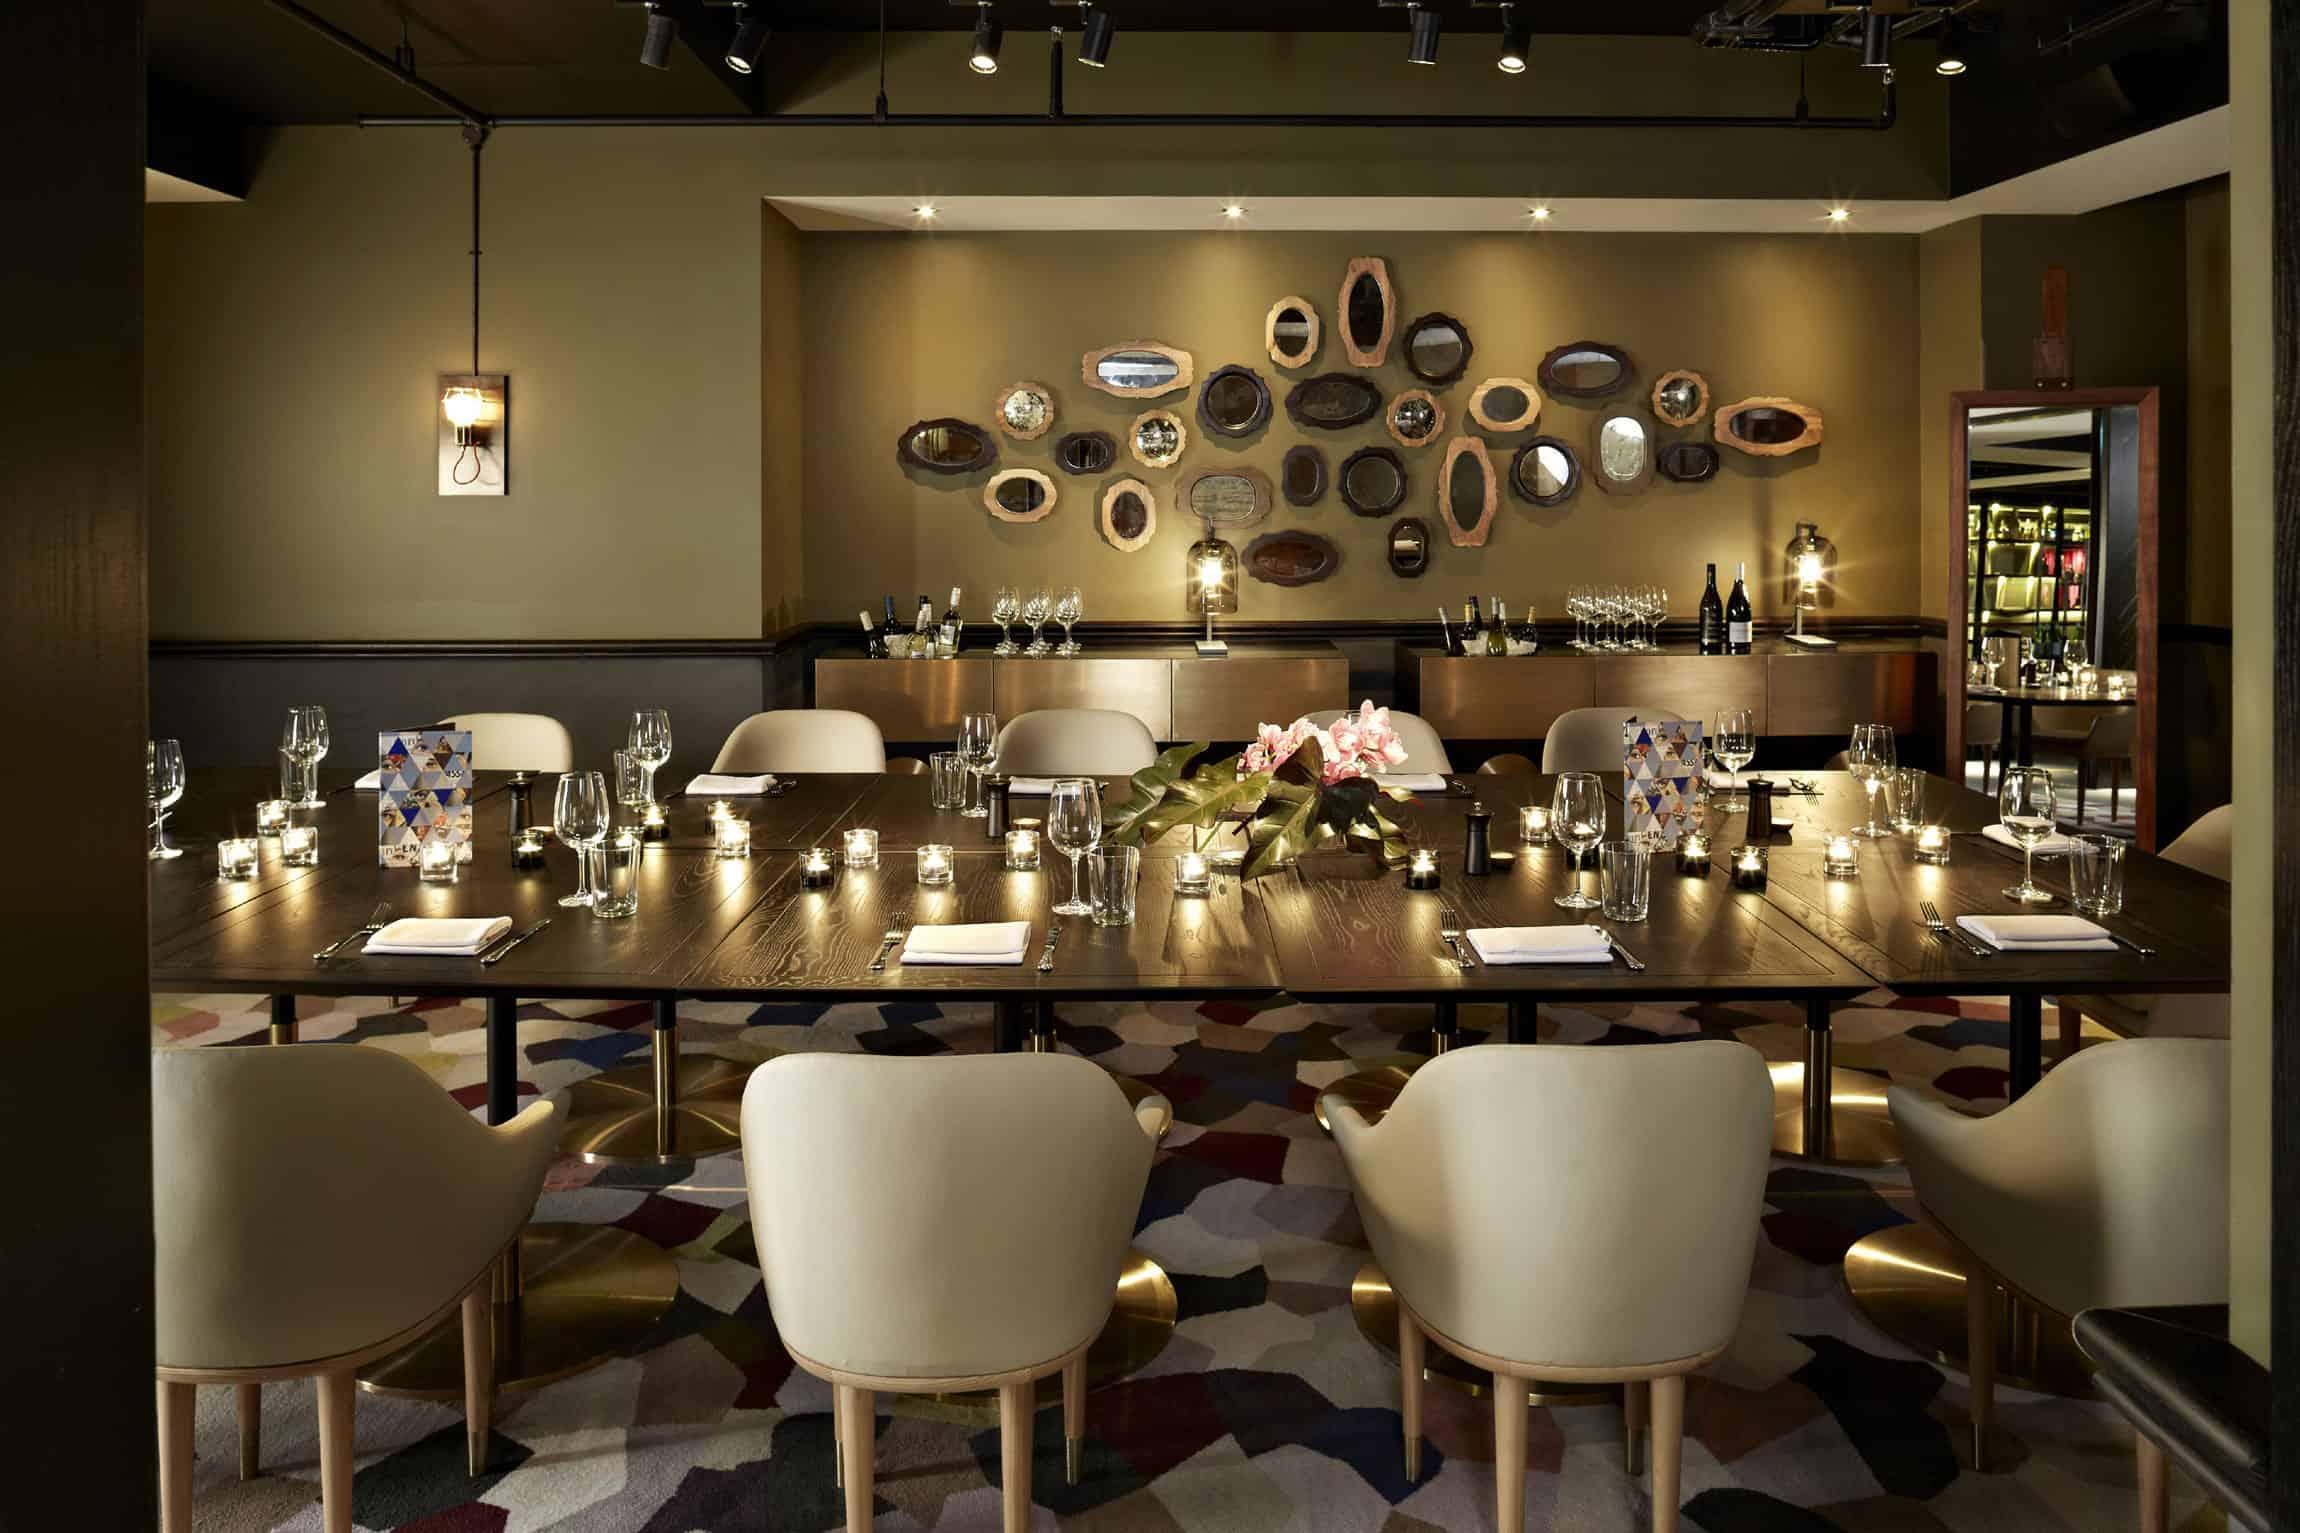 QT Sydney Hotel by Woodhead, Indyk Architects, and Nicholas Graham + Associates